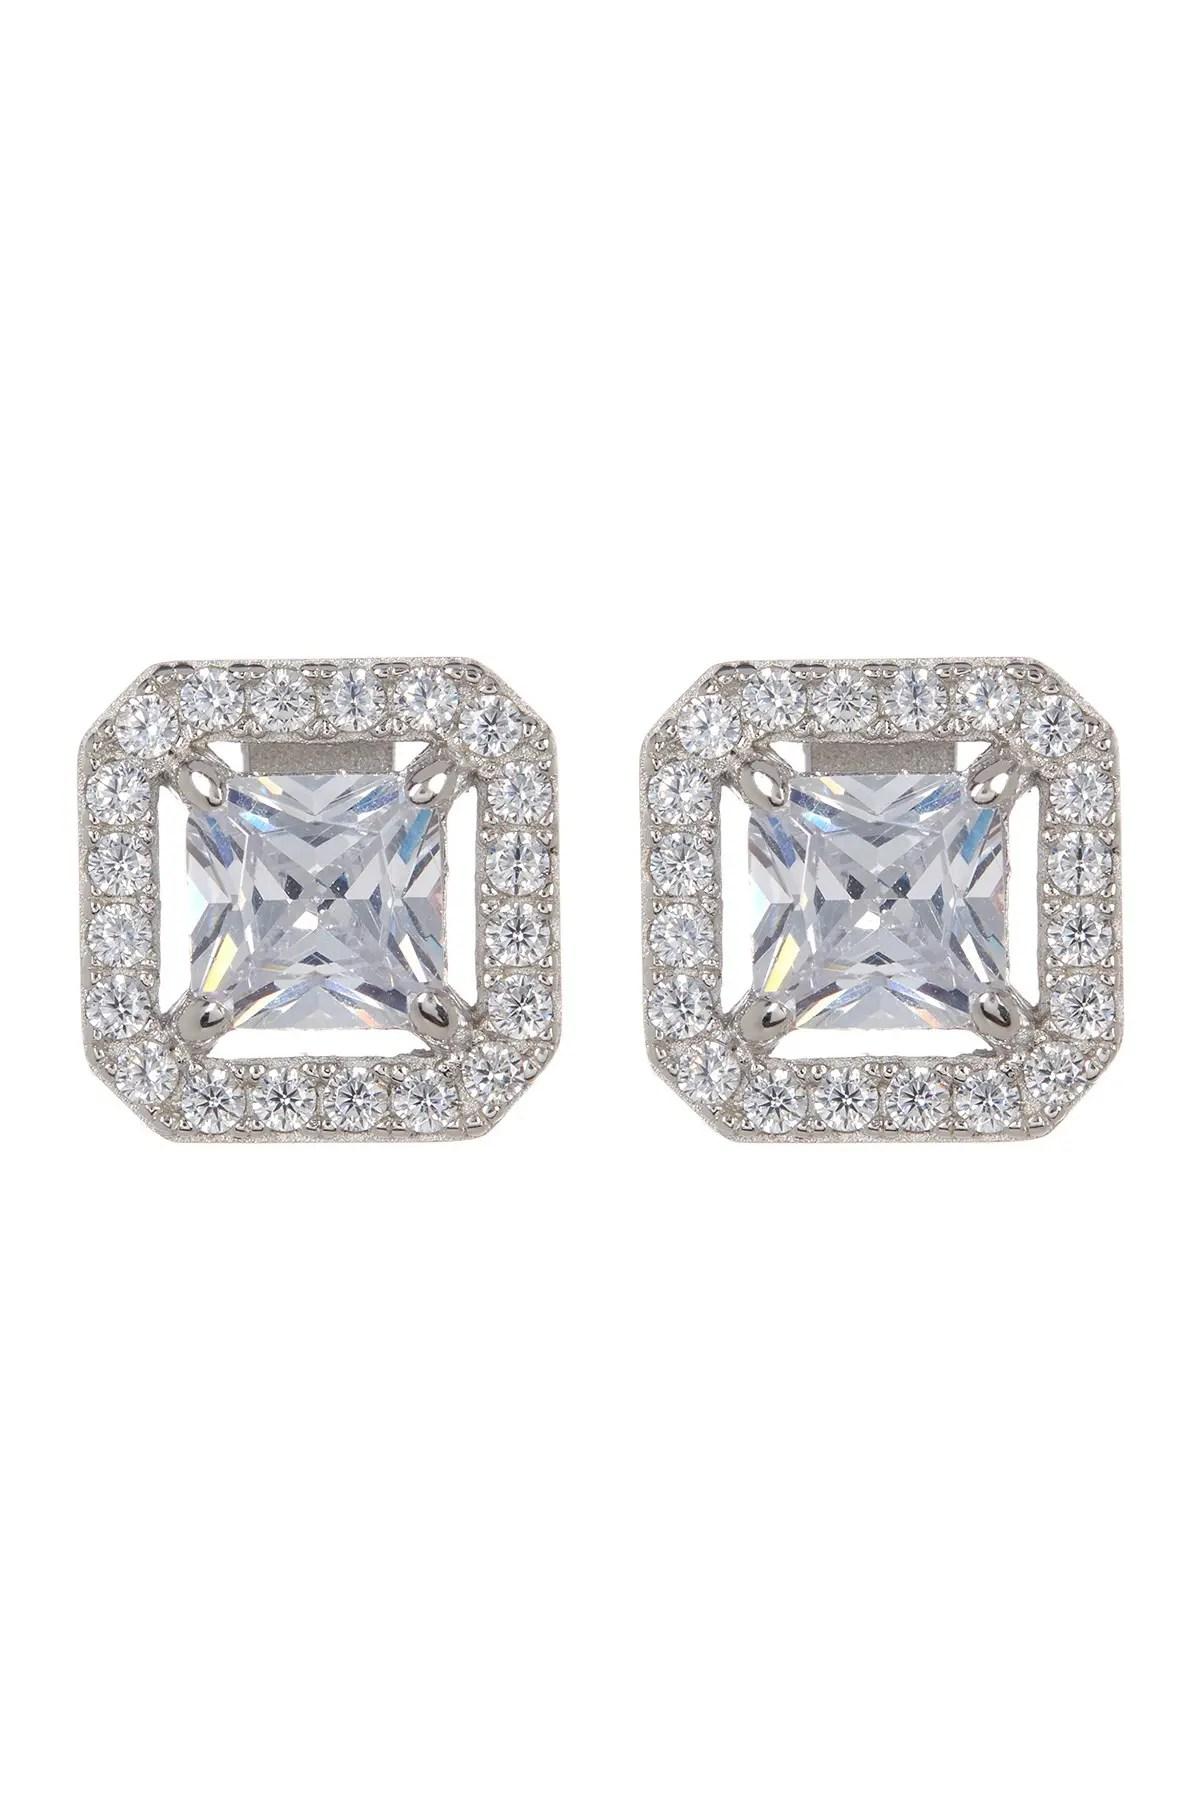 princess cz pave stud earrings